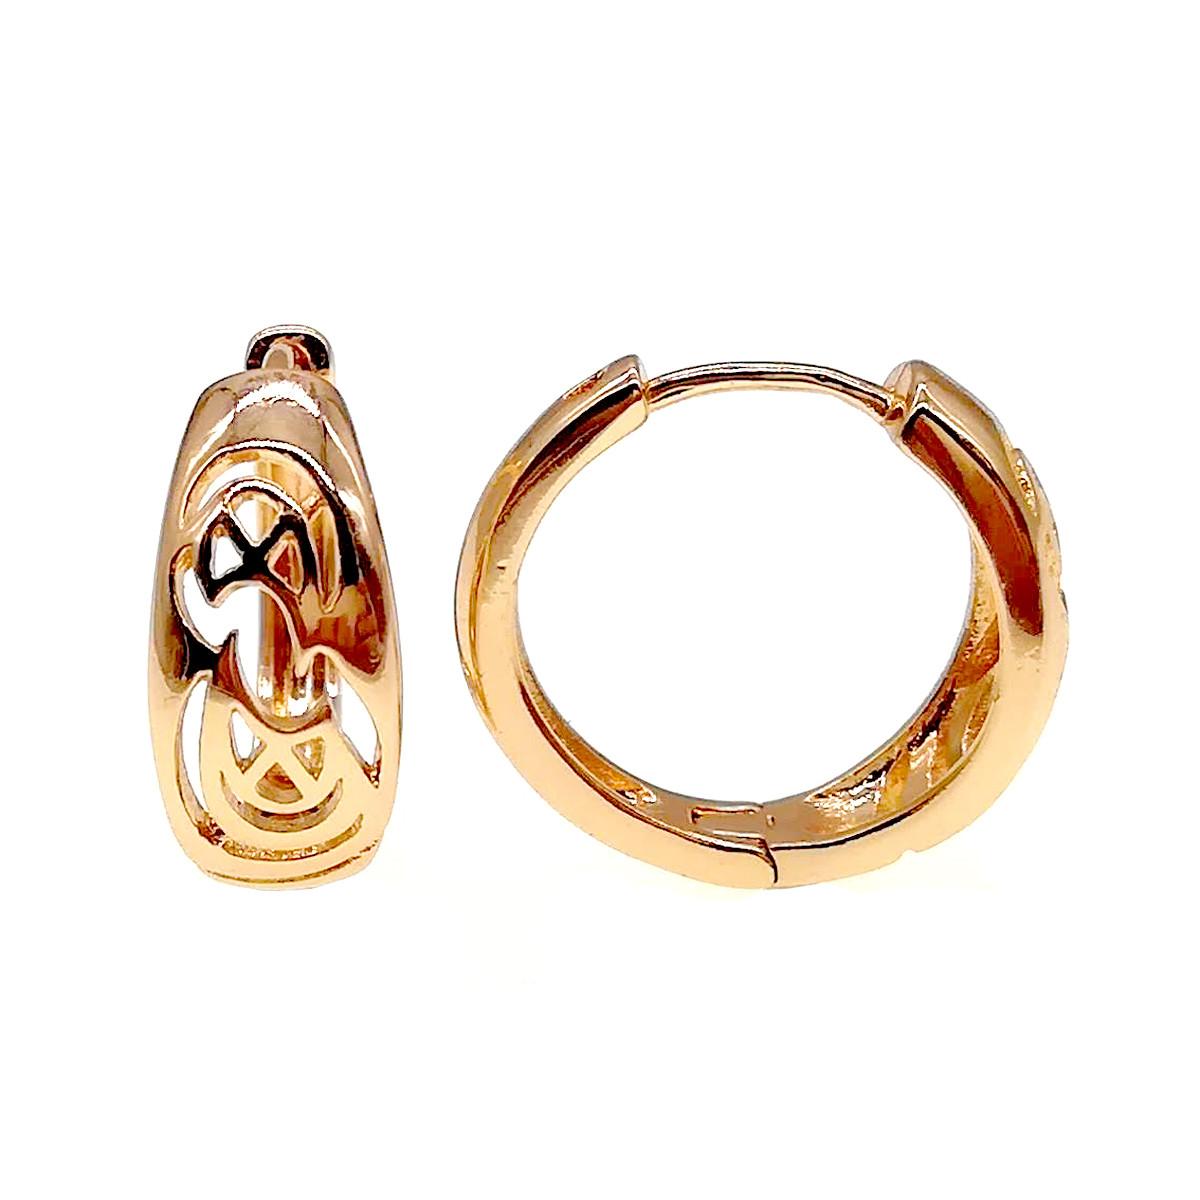 Сережки Xuping з медичного золота, позолота 18К, 23886 (1)